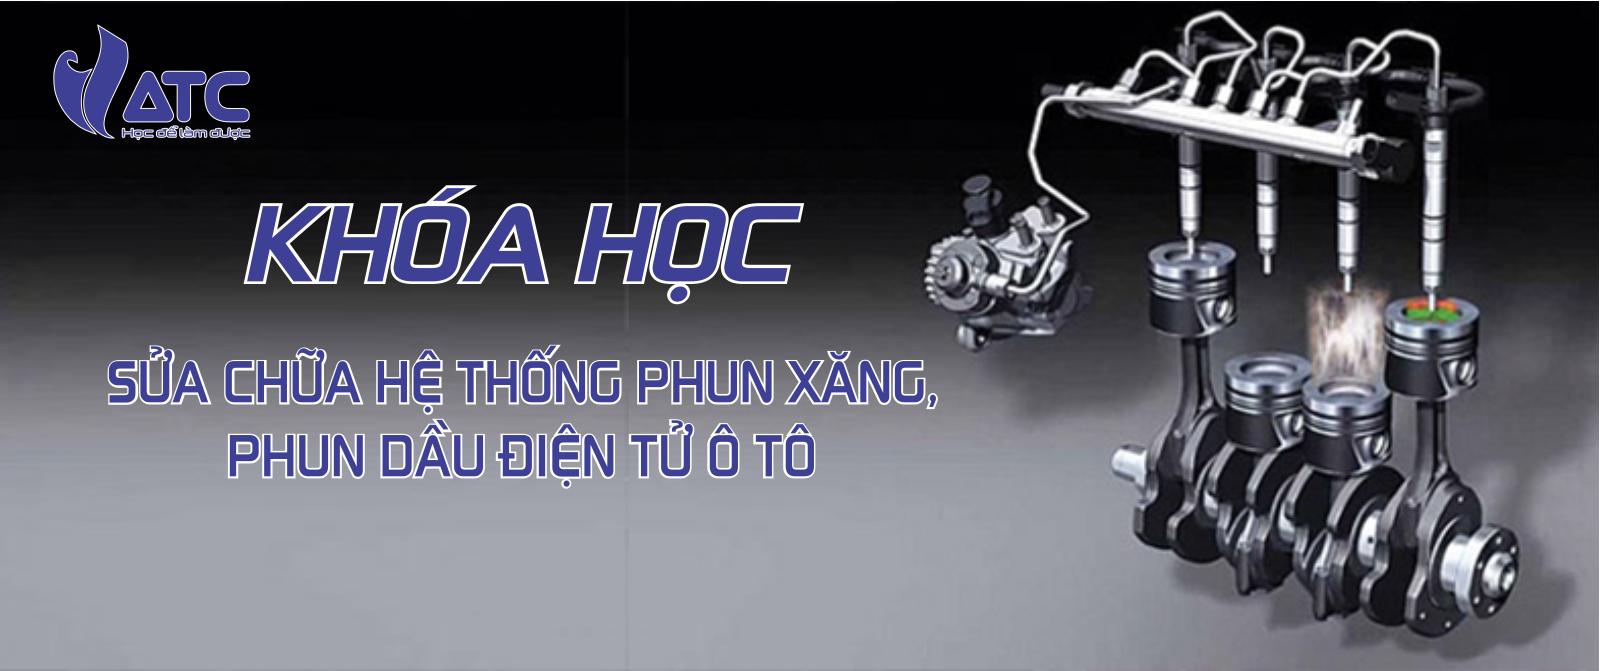 khoa-hoc-phun-xang-phun-dau-trung-tam-huan-luyen-ky-thuat-o-to